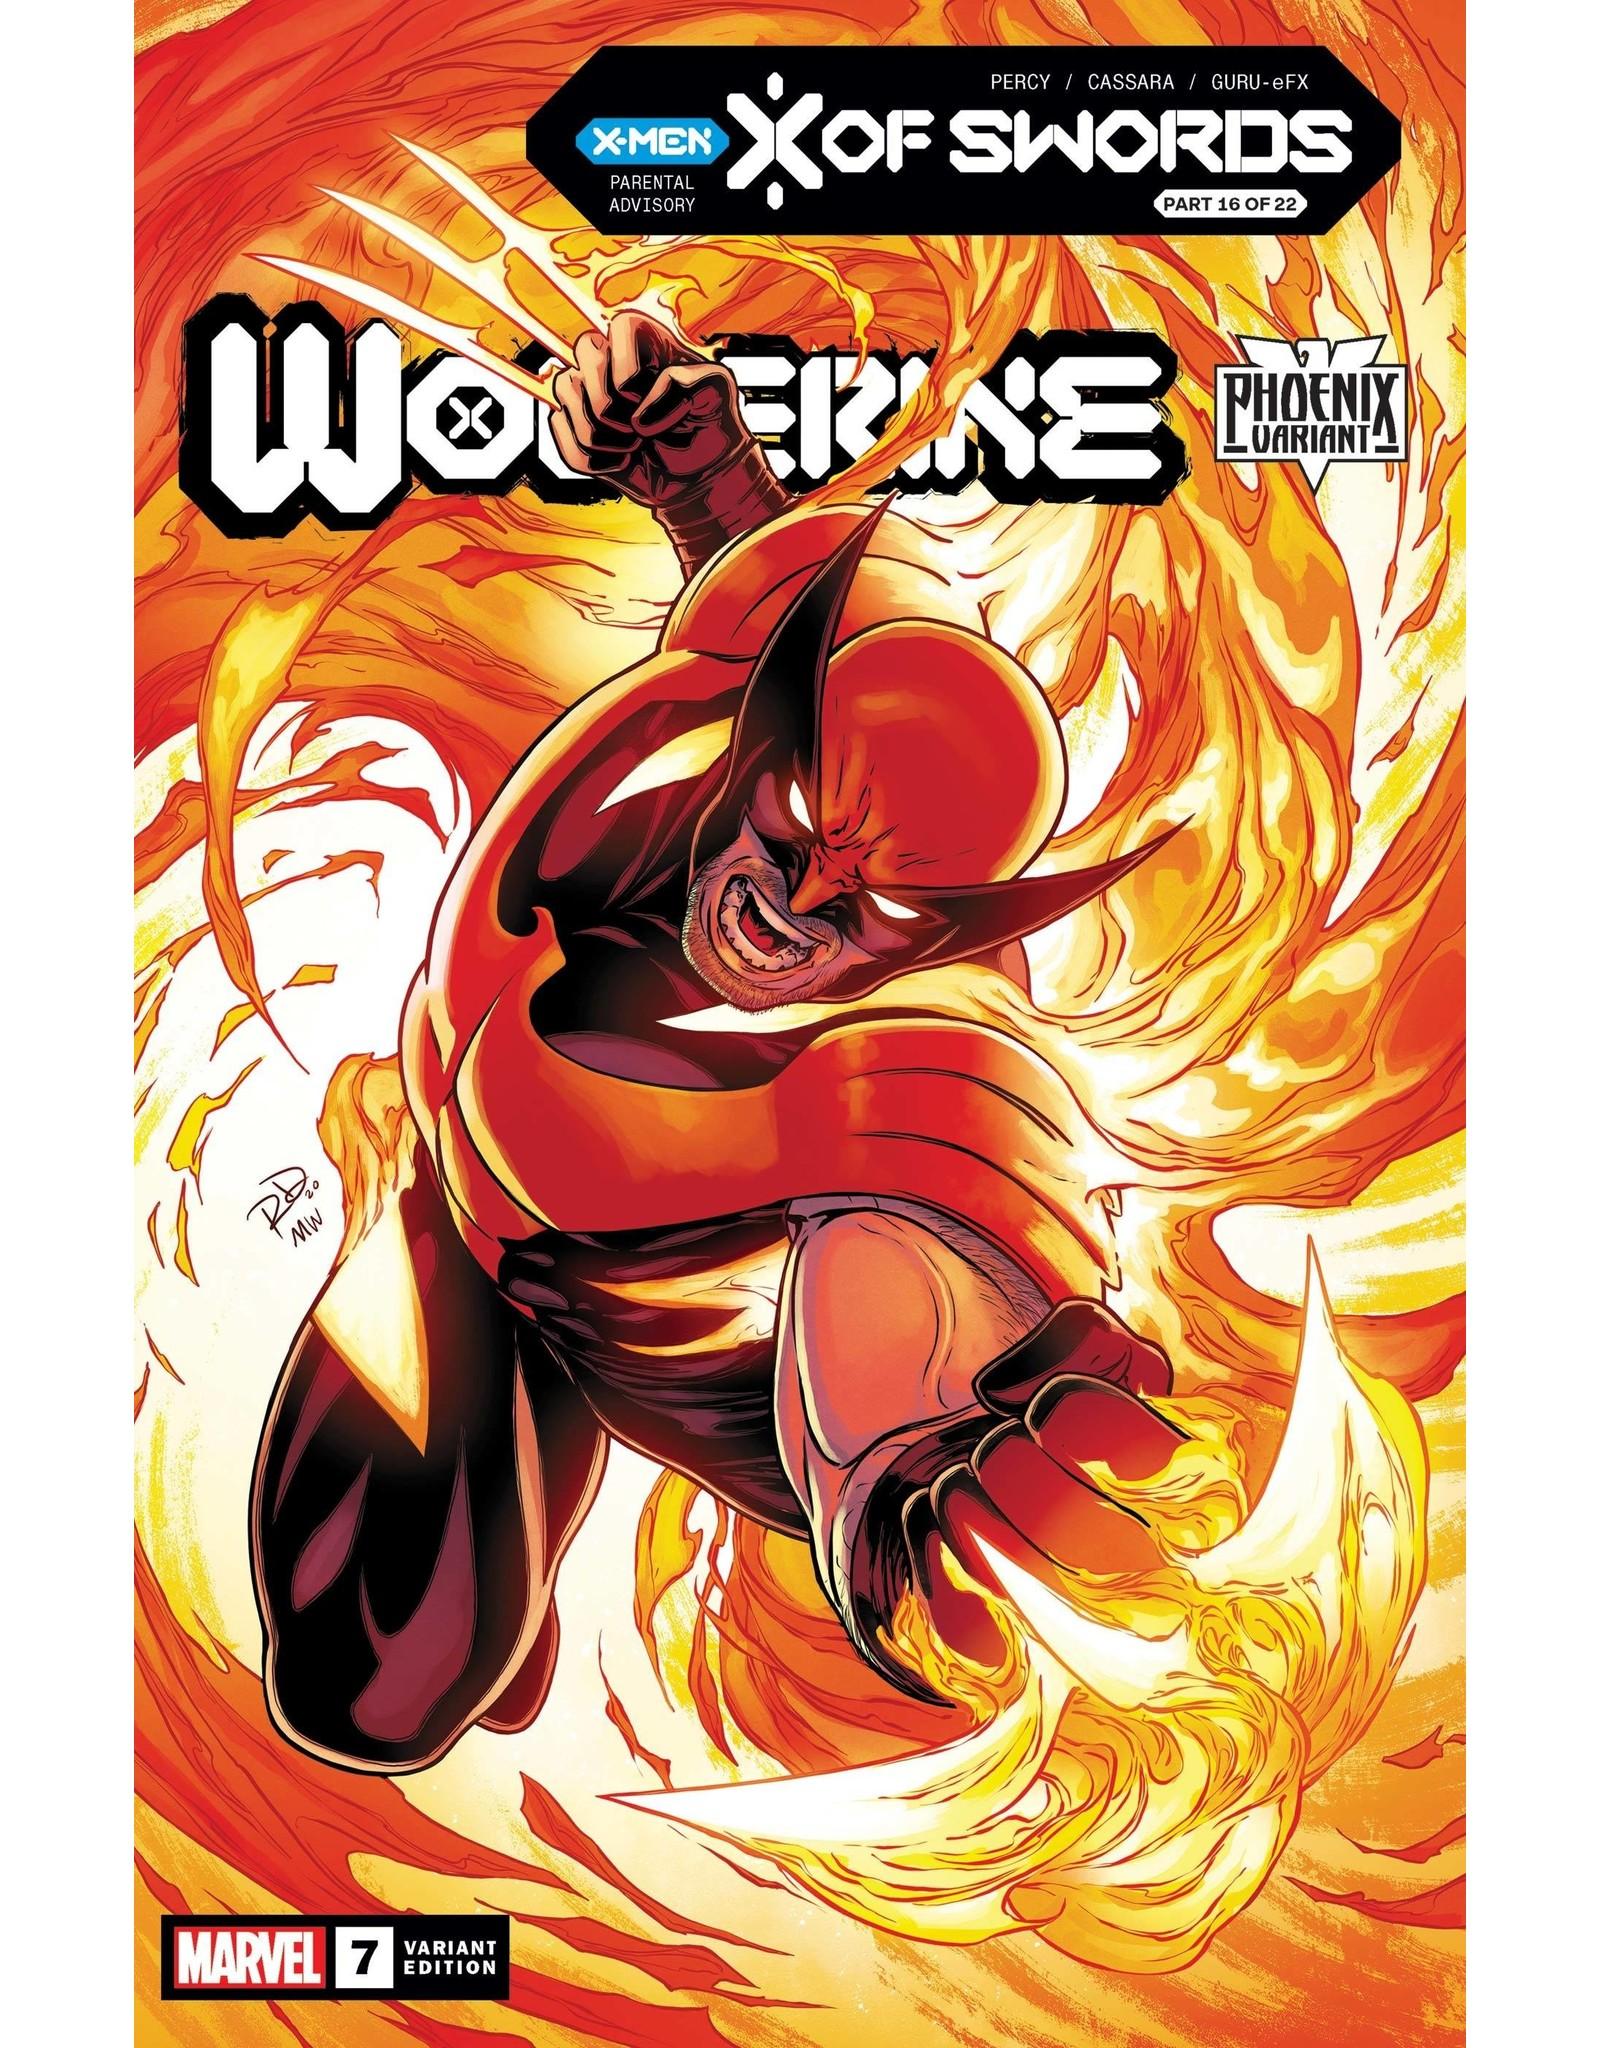 MARVEL COMICS WOLVERINE #7 DAUTERMAN WOLVERINE PHOENIX VAR XOS